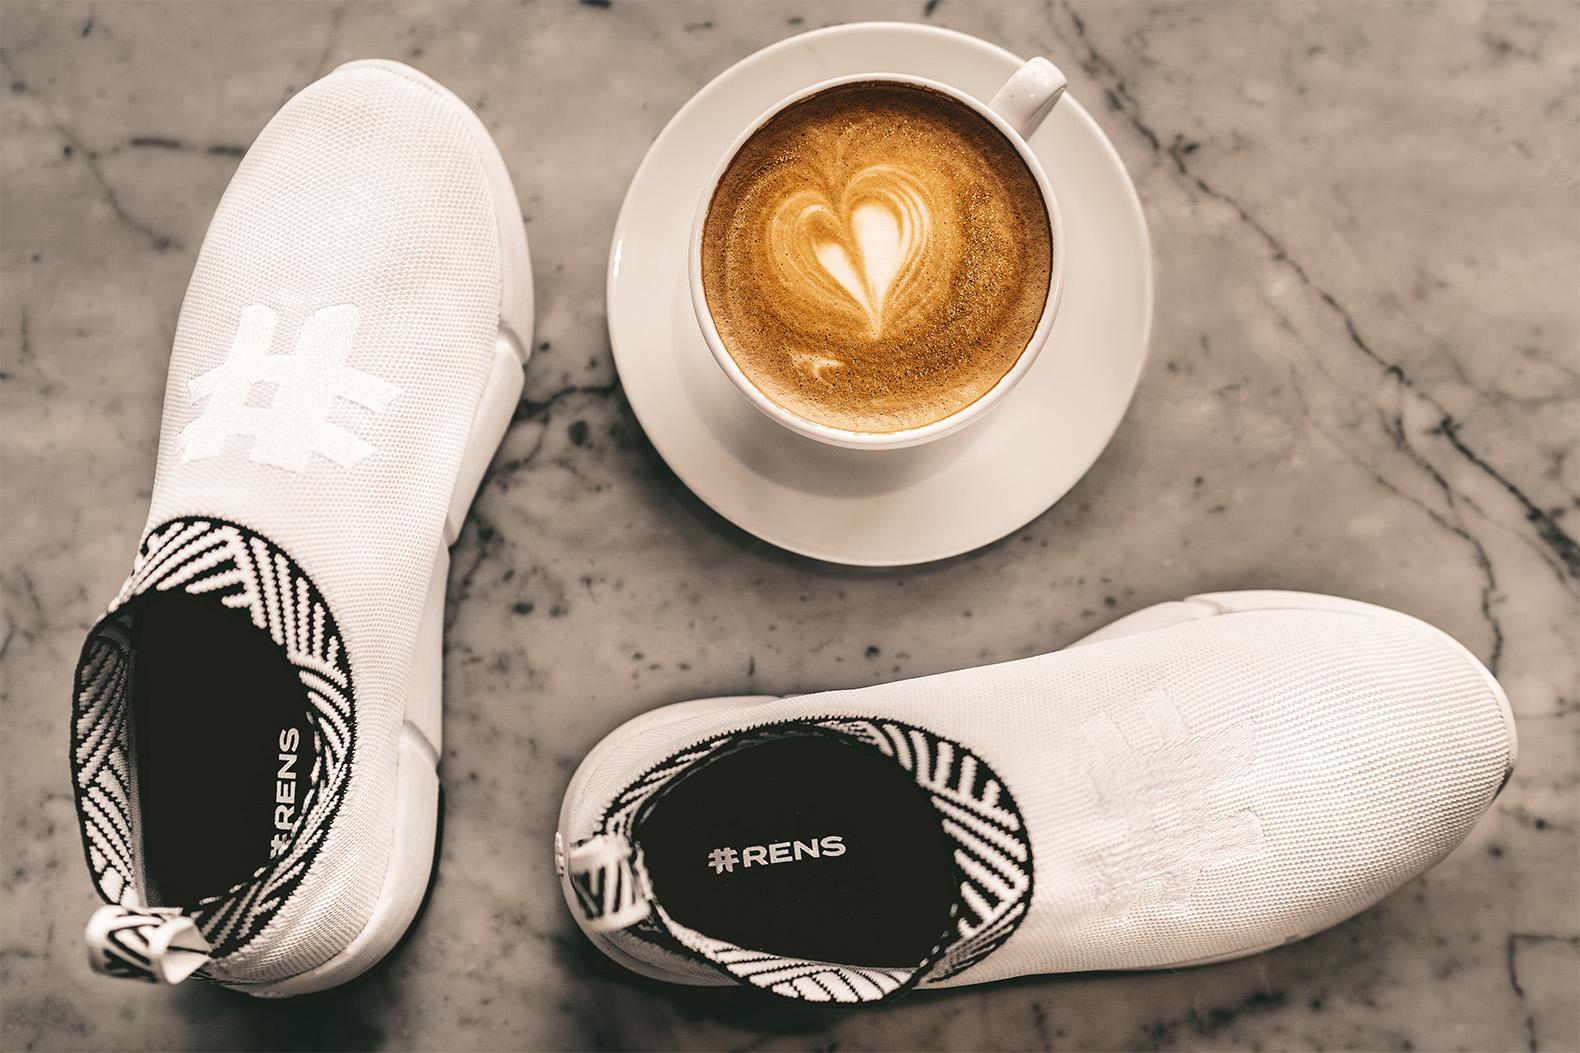 Sneakers aus Kaffee? Das geht! (Foto: Rens)